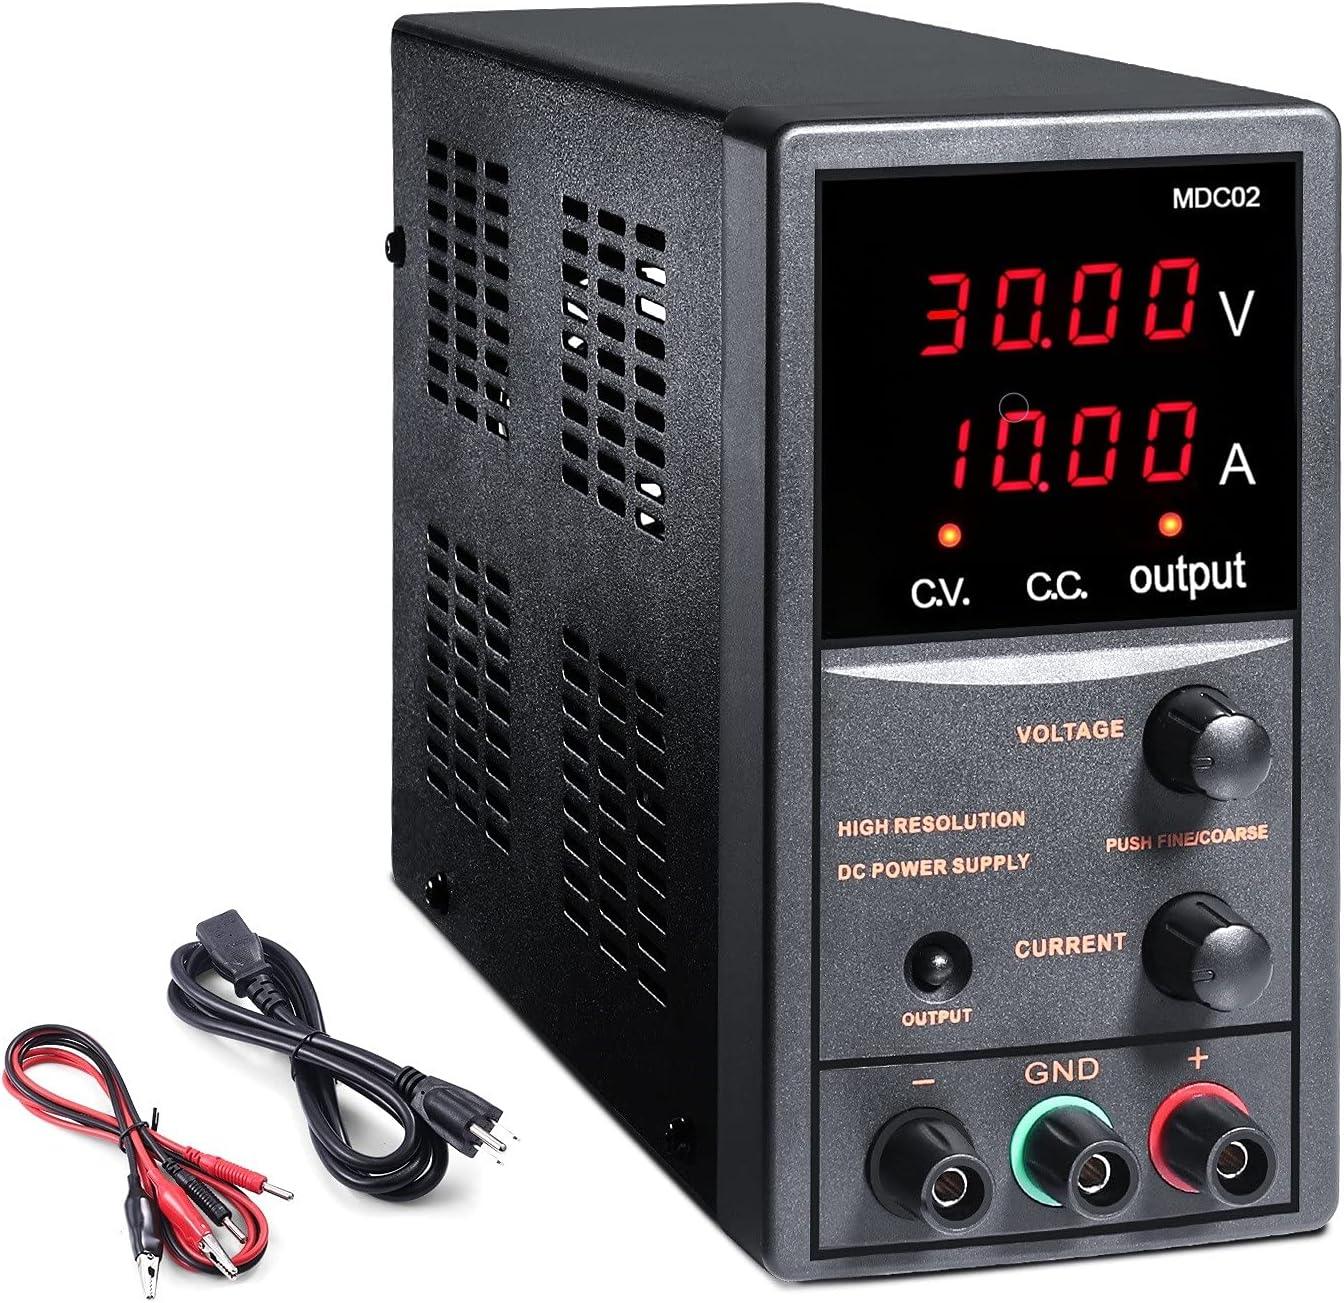 Ttkk   10A 30V DC Power Supply Variable $49.97 Coupon